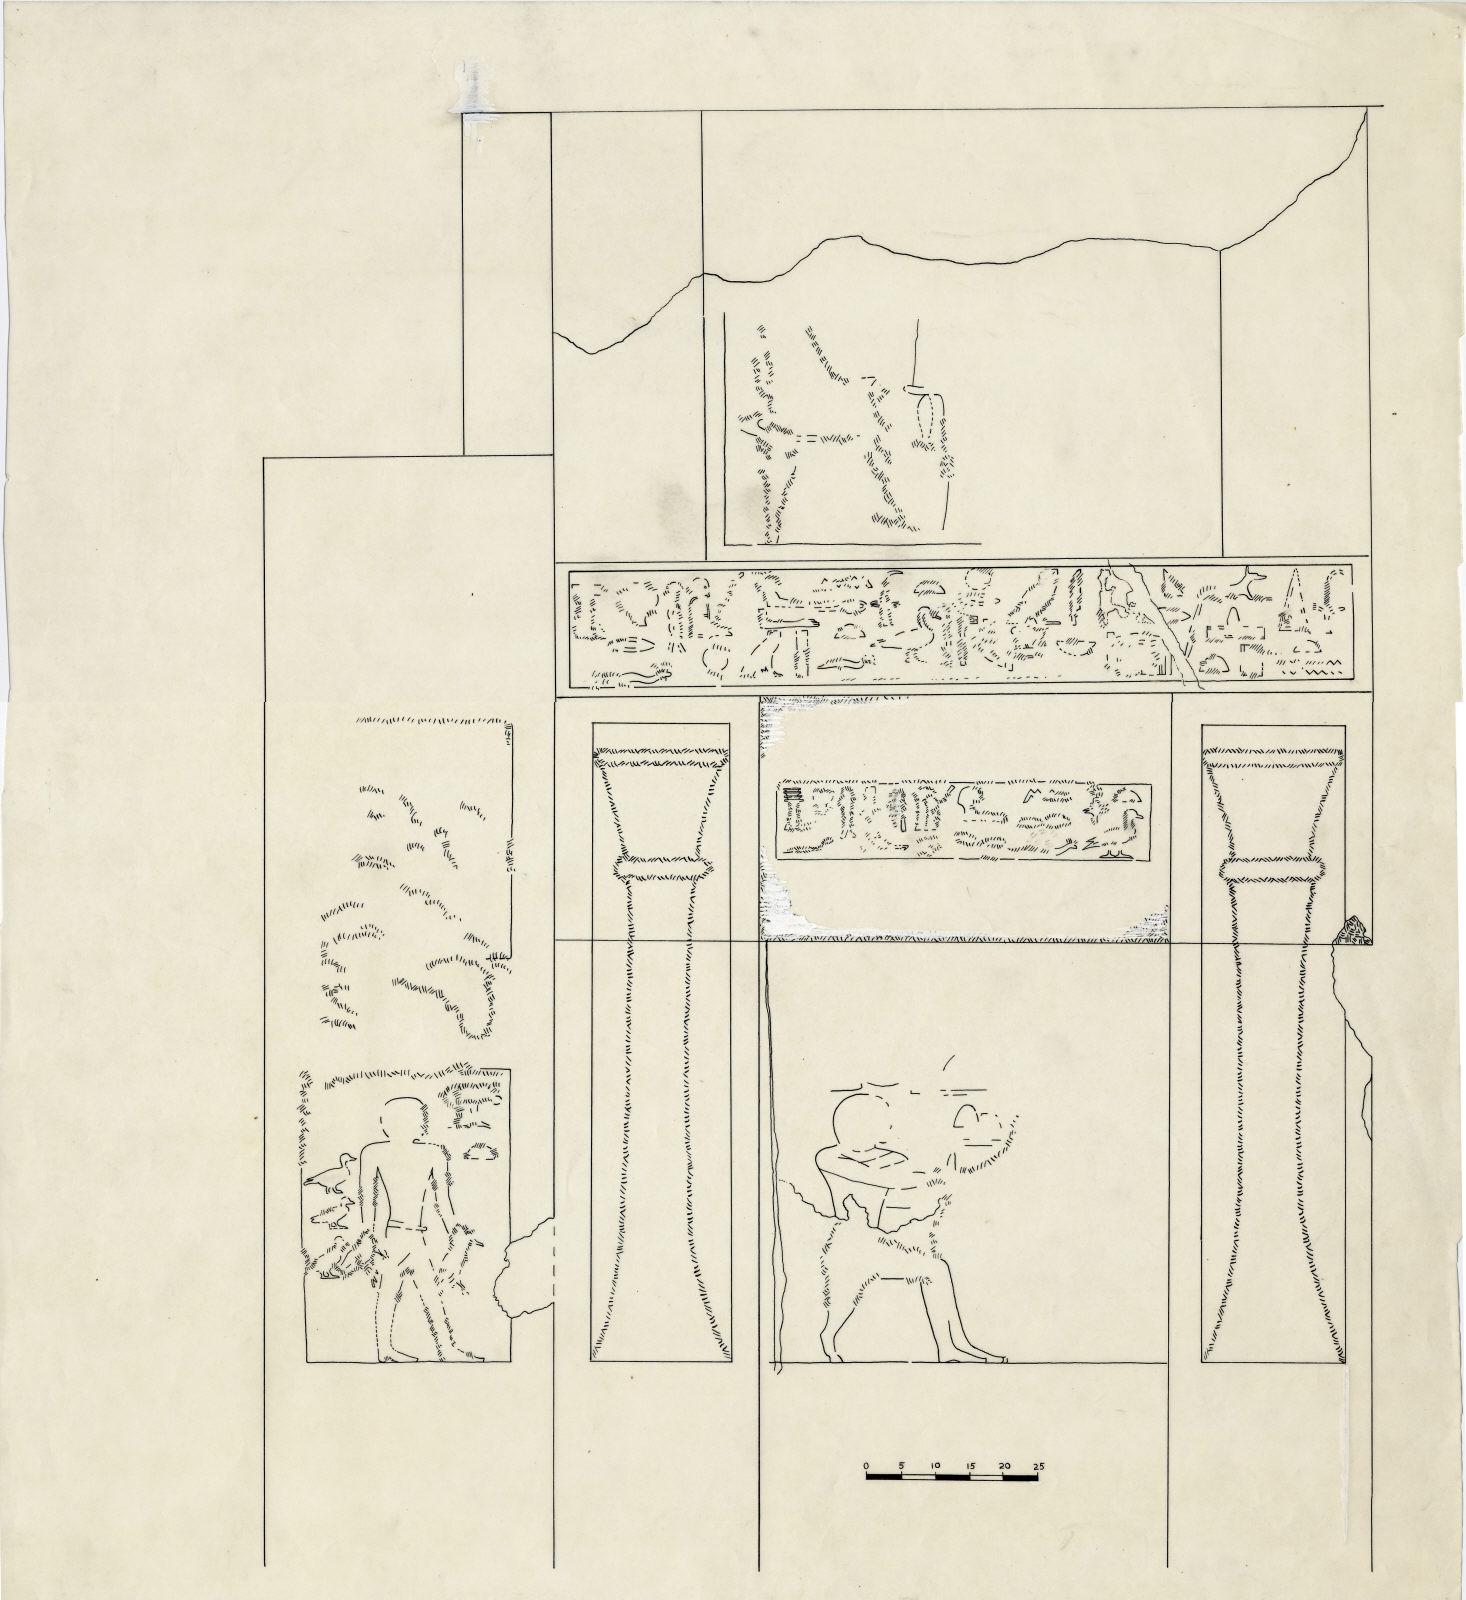 Drawings: G 7210-7220: G 7220: chapel, niche